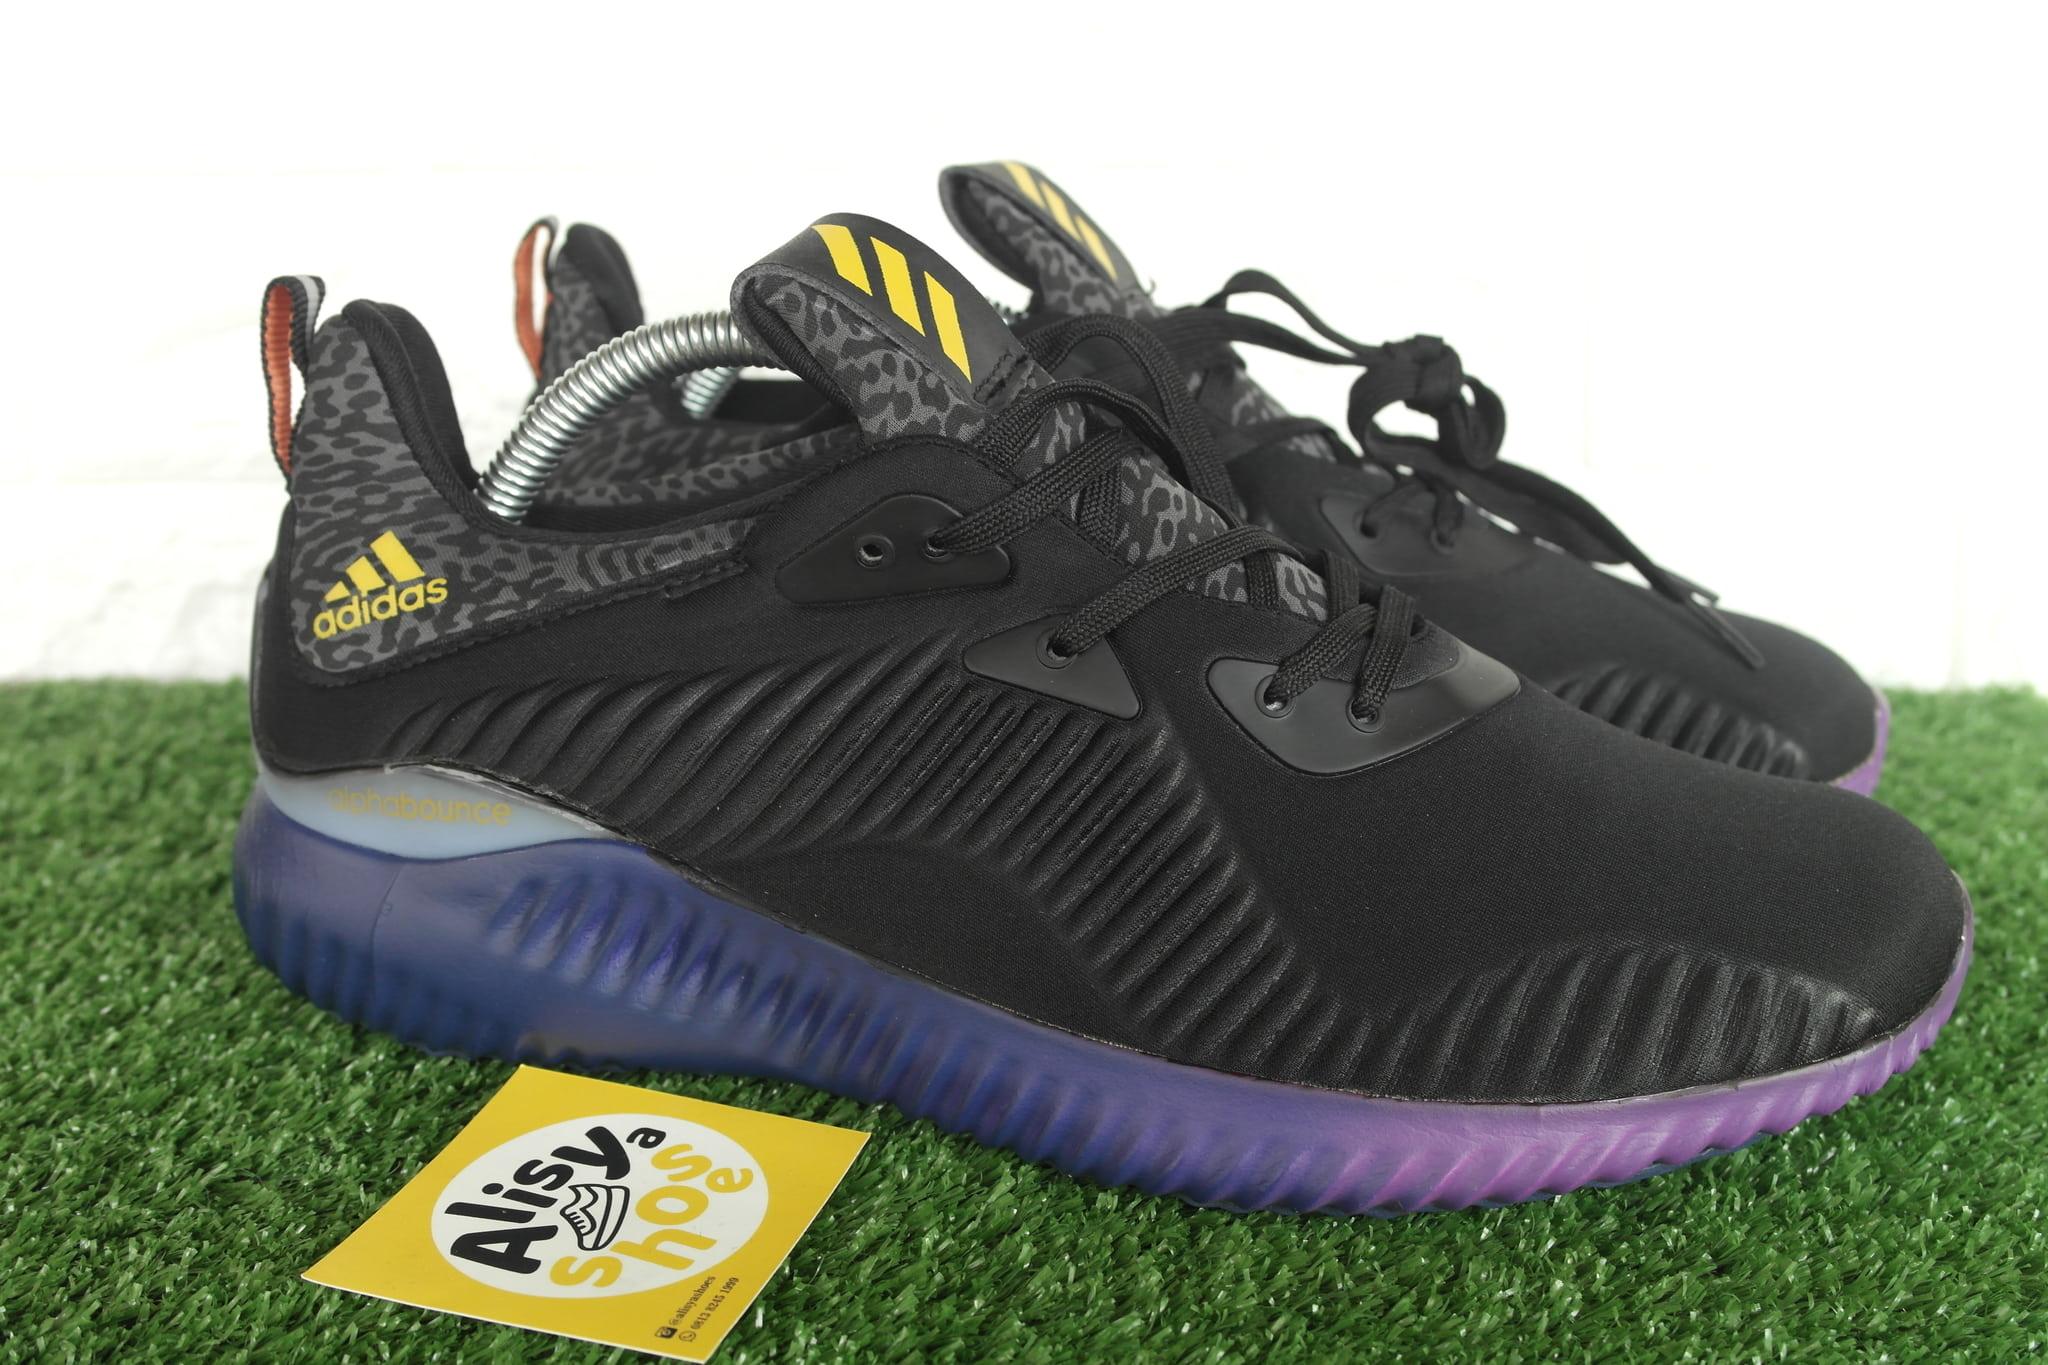 9d09ef6b5b686 Jual Sepatu Adidas Alphabounce Black Purple - Alisyashoes ...